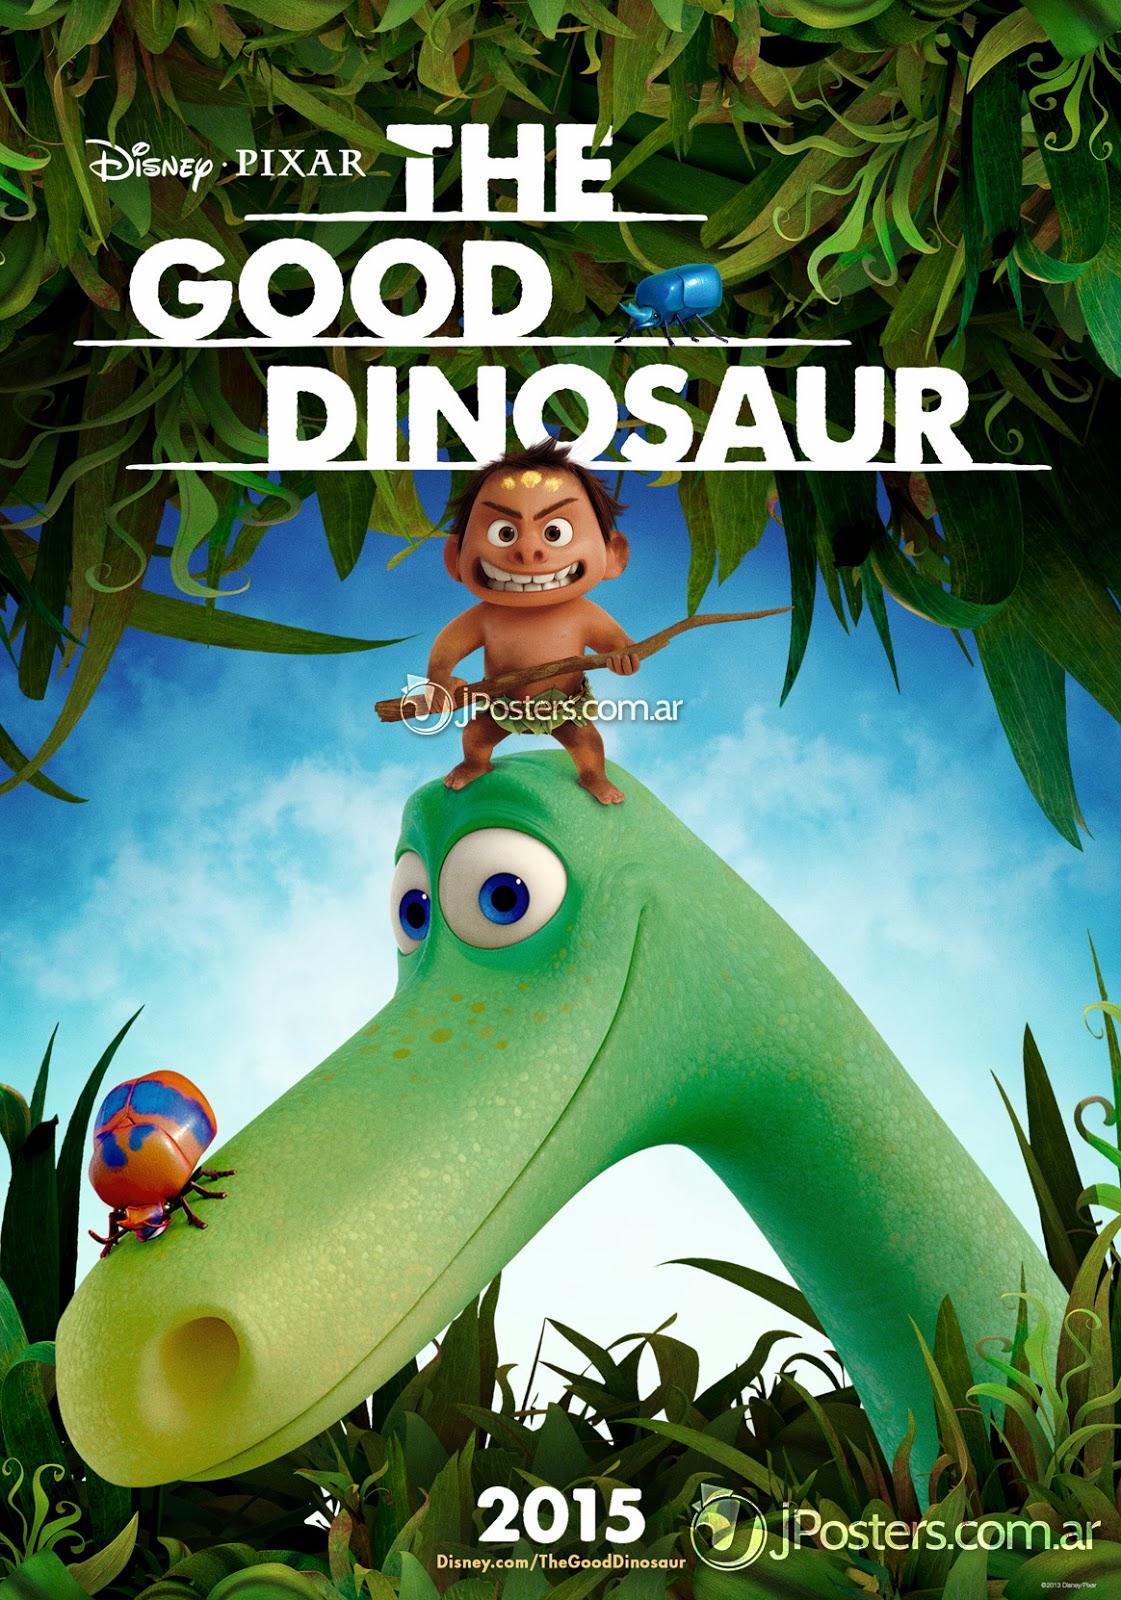 The_Good_Dinosaur_Teaser_Poster_JPosters.jpg